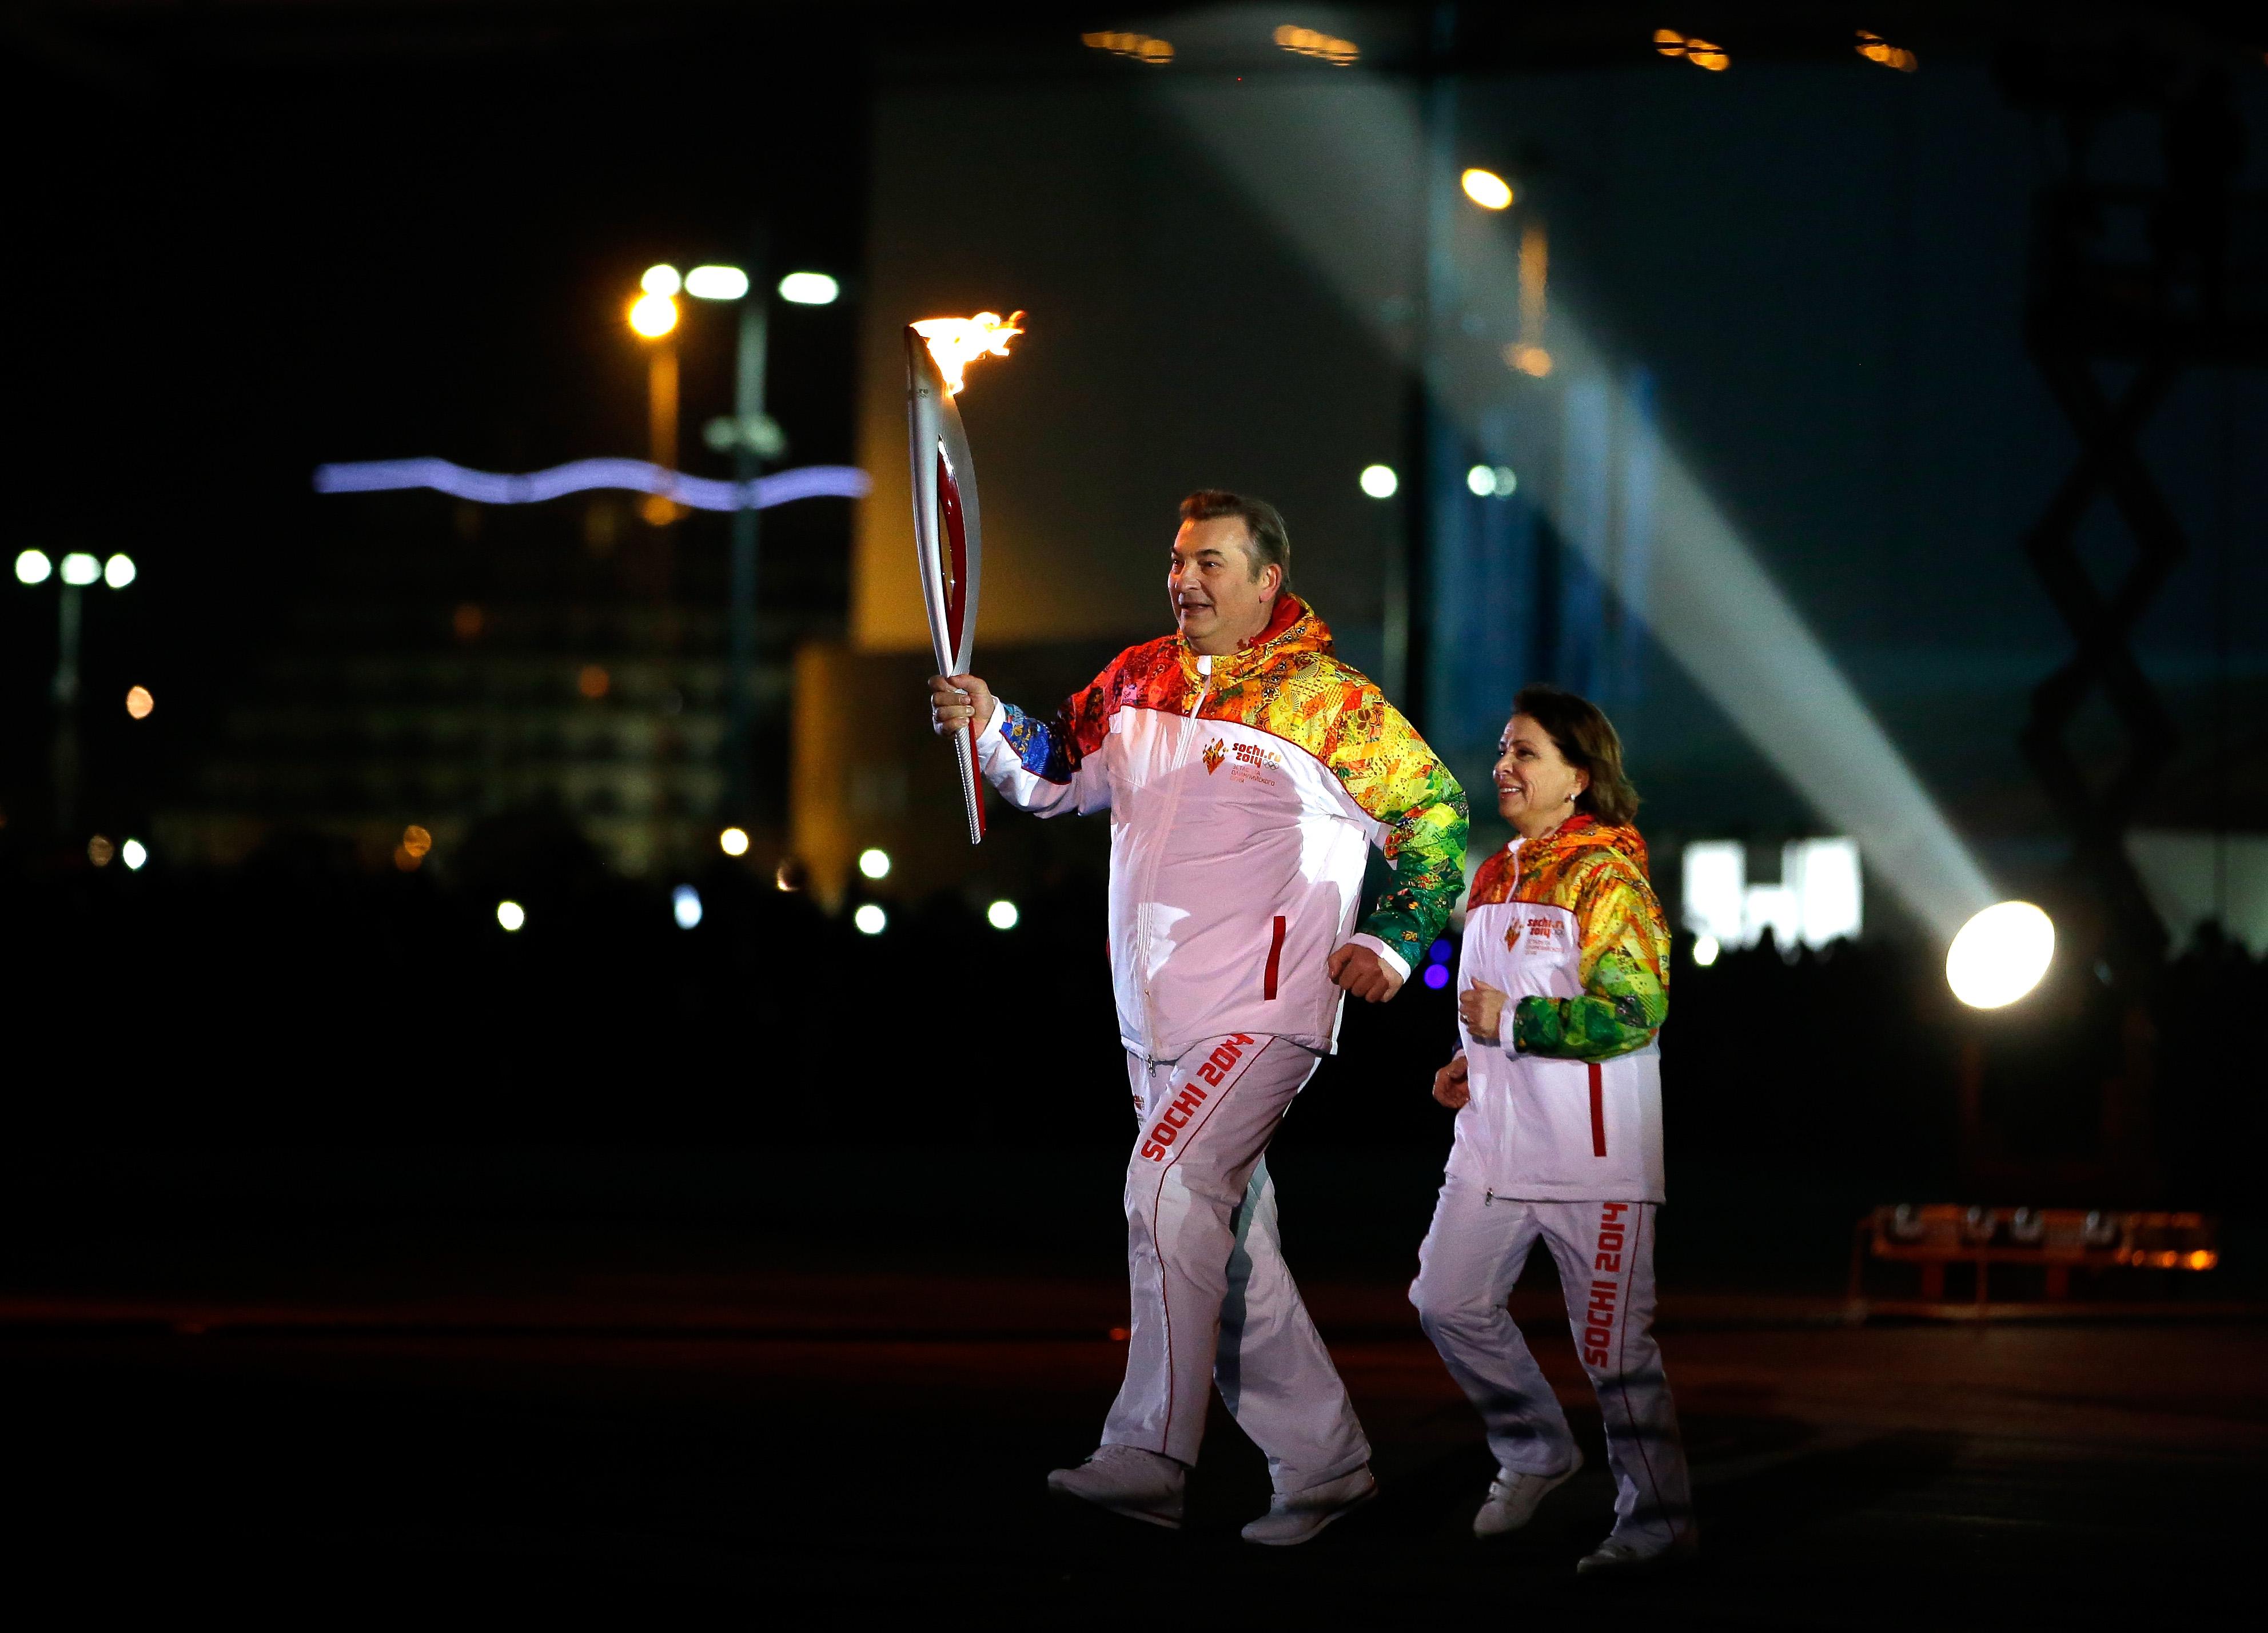 Irina Rodnina and Vladislav Tretiak Lighting Olympic Torch/NBS Sports